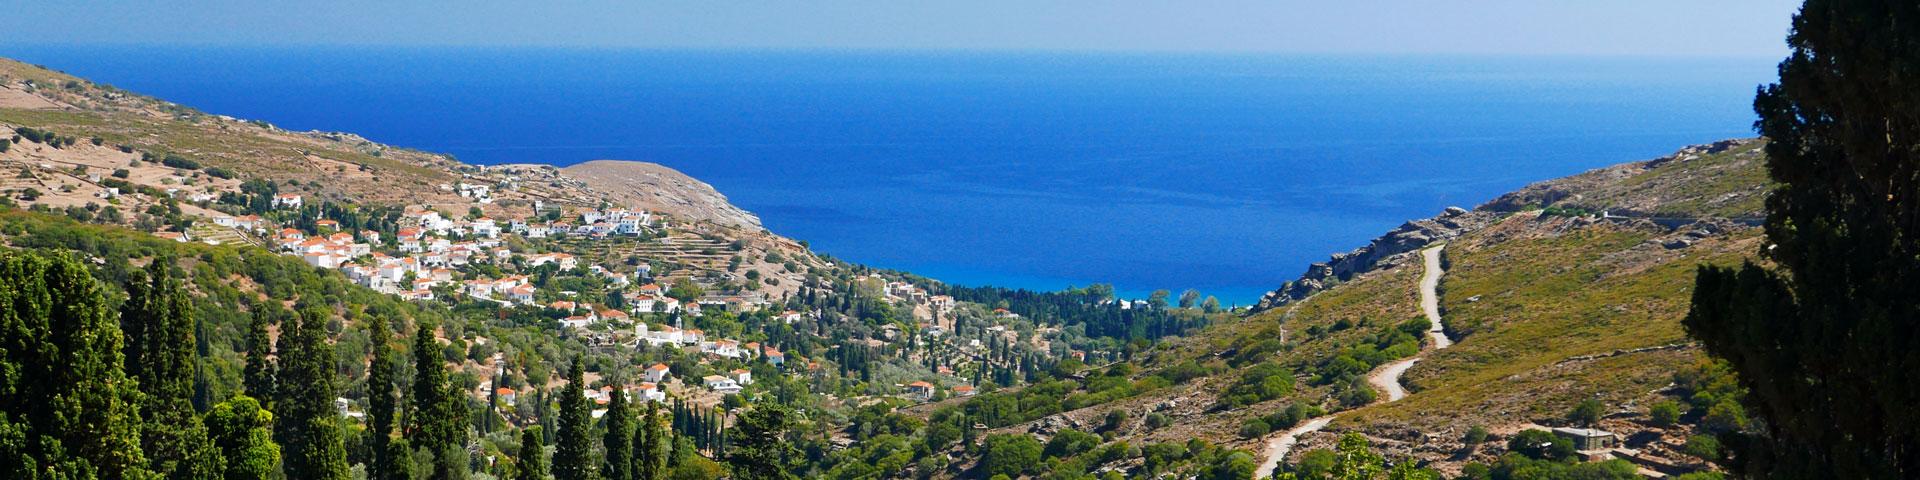 Autentic Islands hiking in Greece